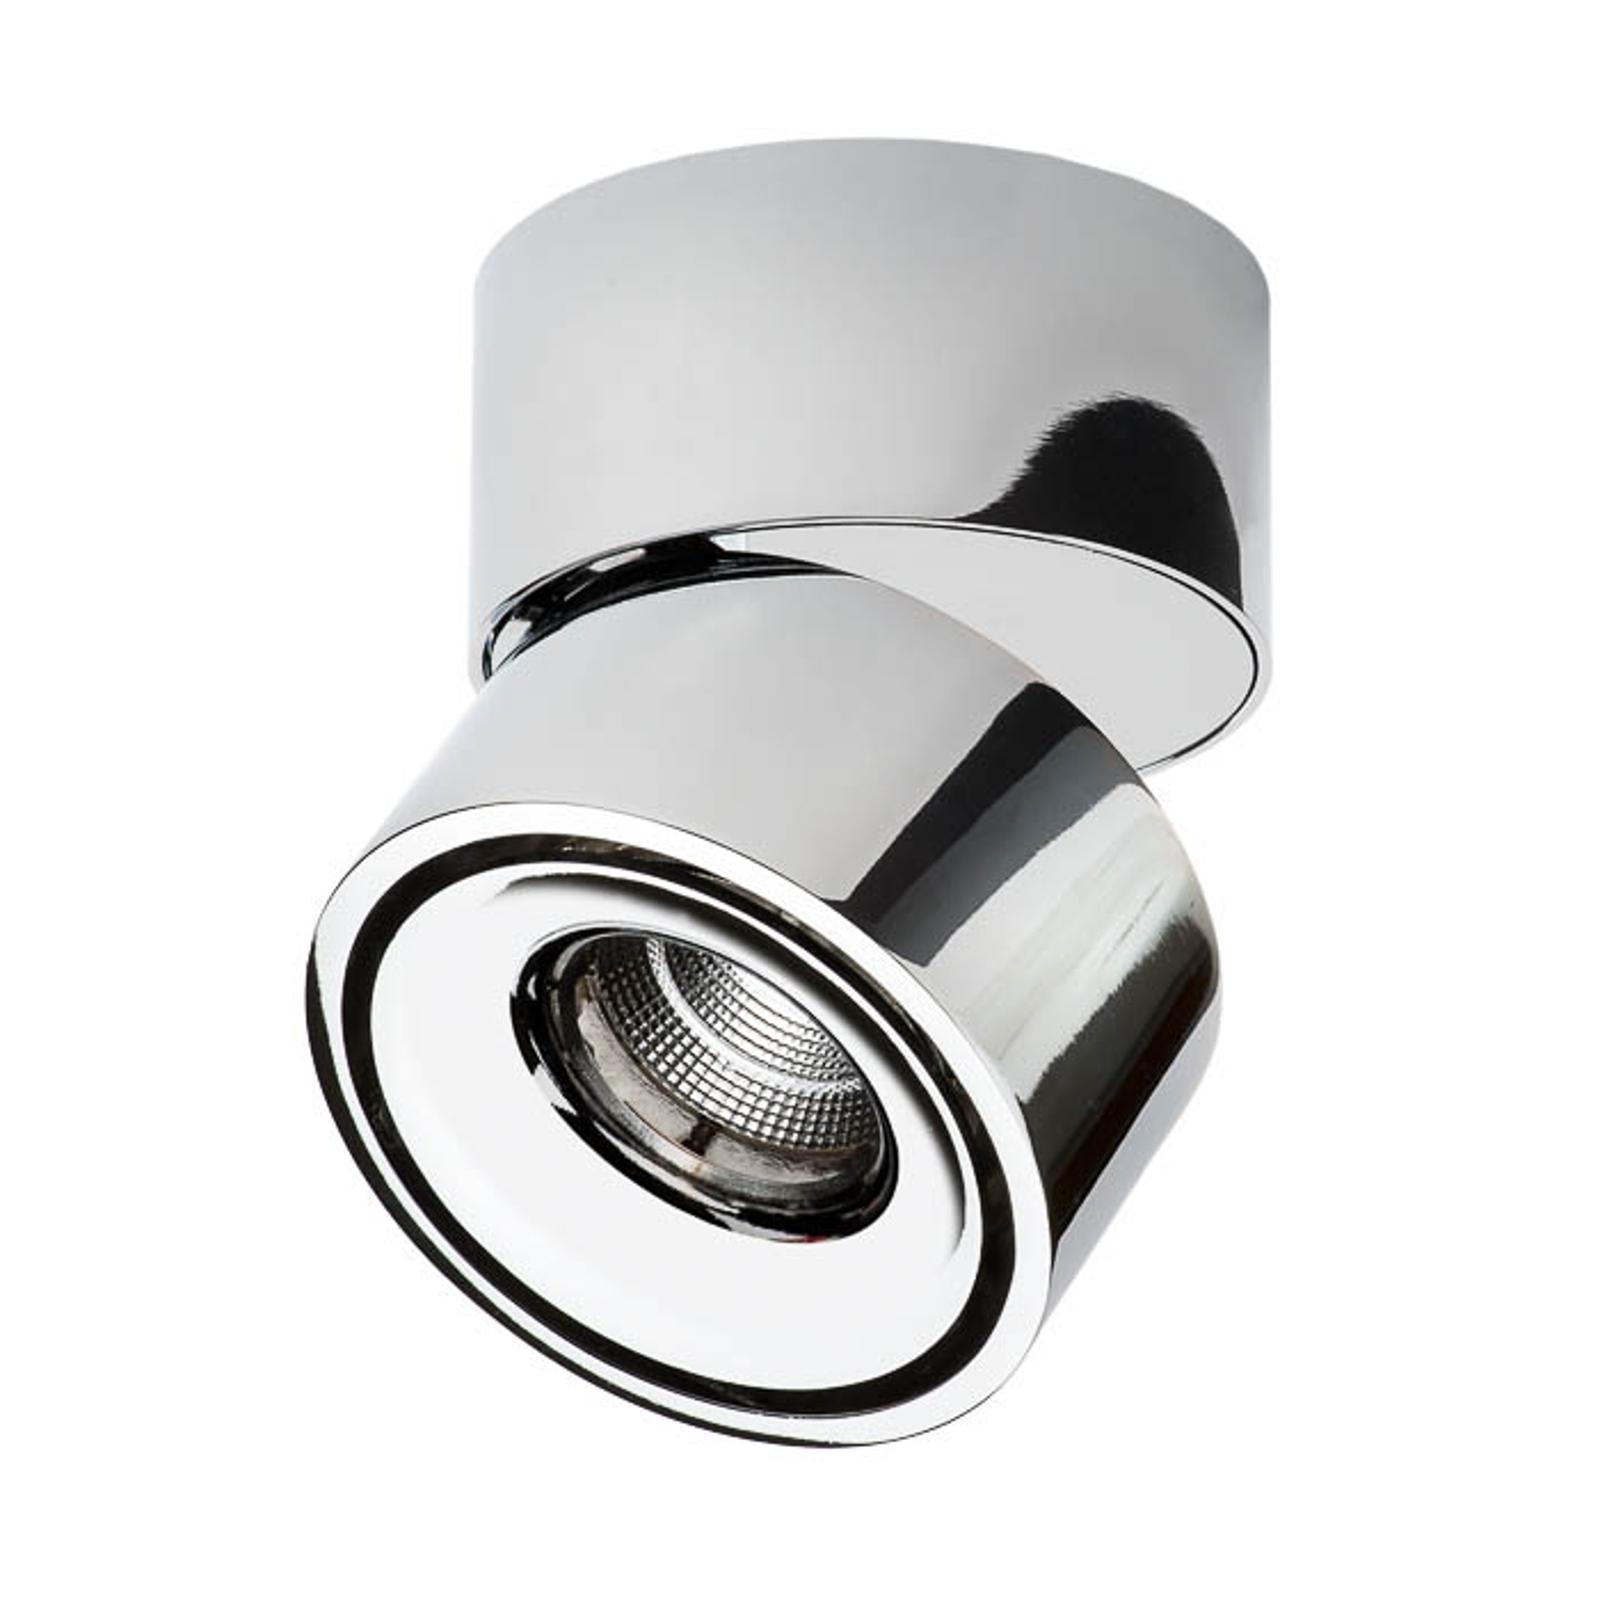 Decor Walther Studio LED-Deckenspot chrom, Ø 10cm